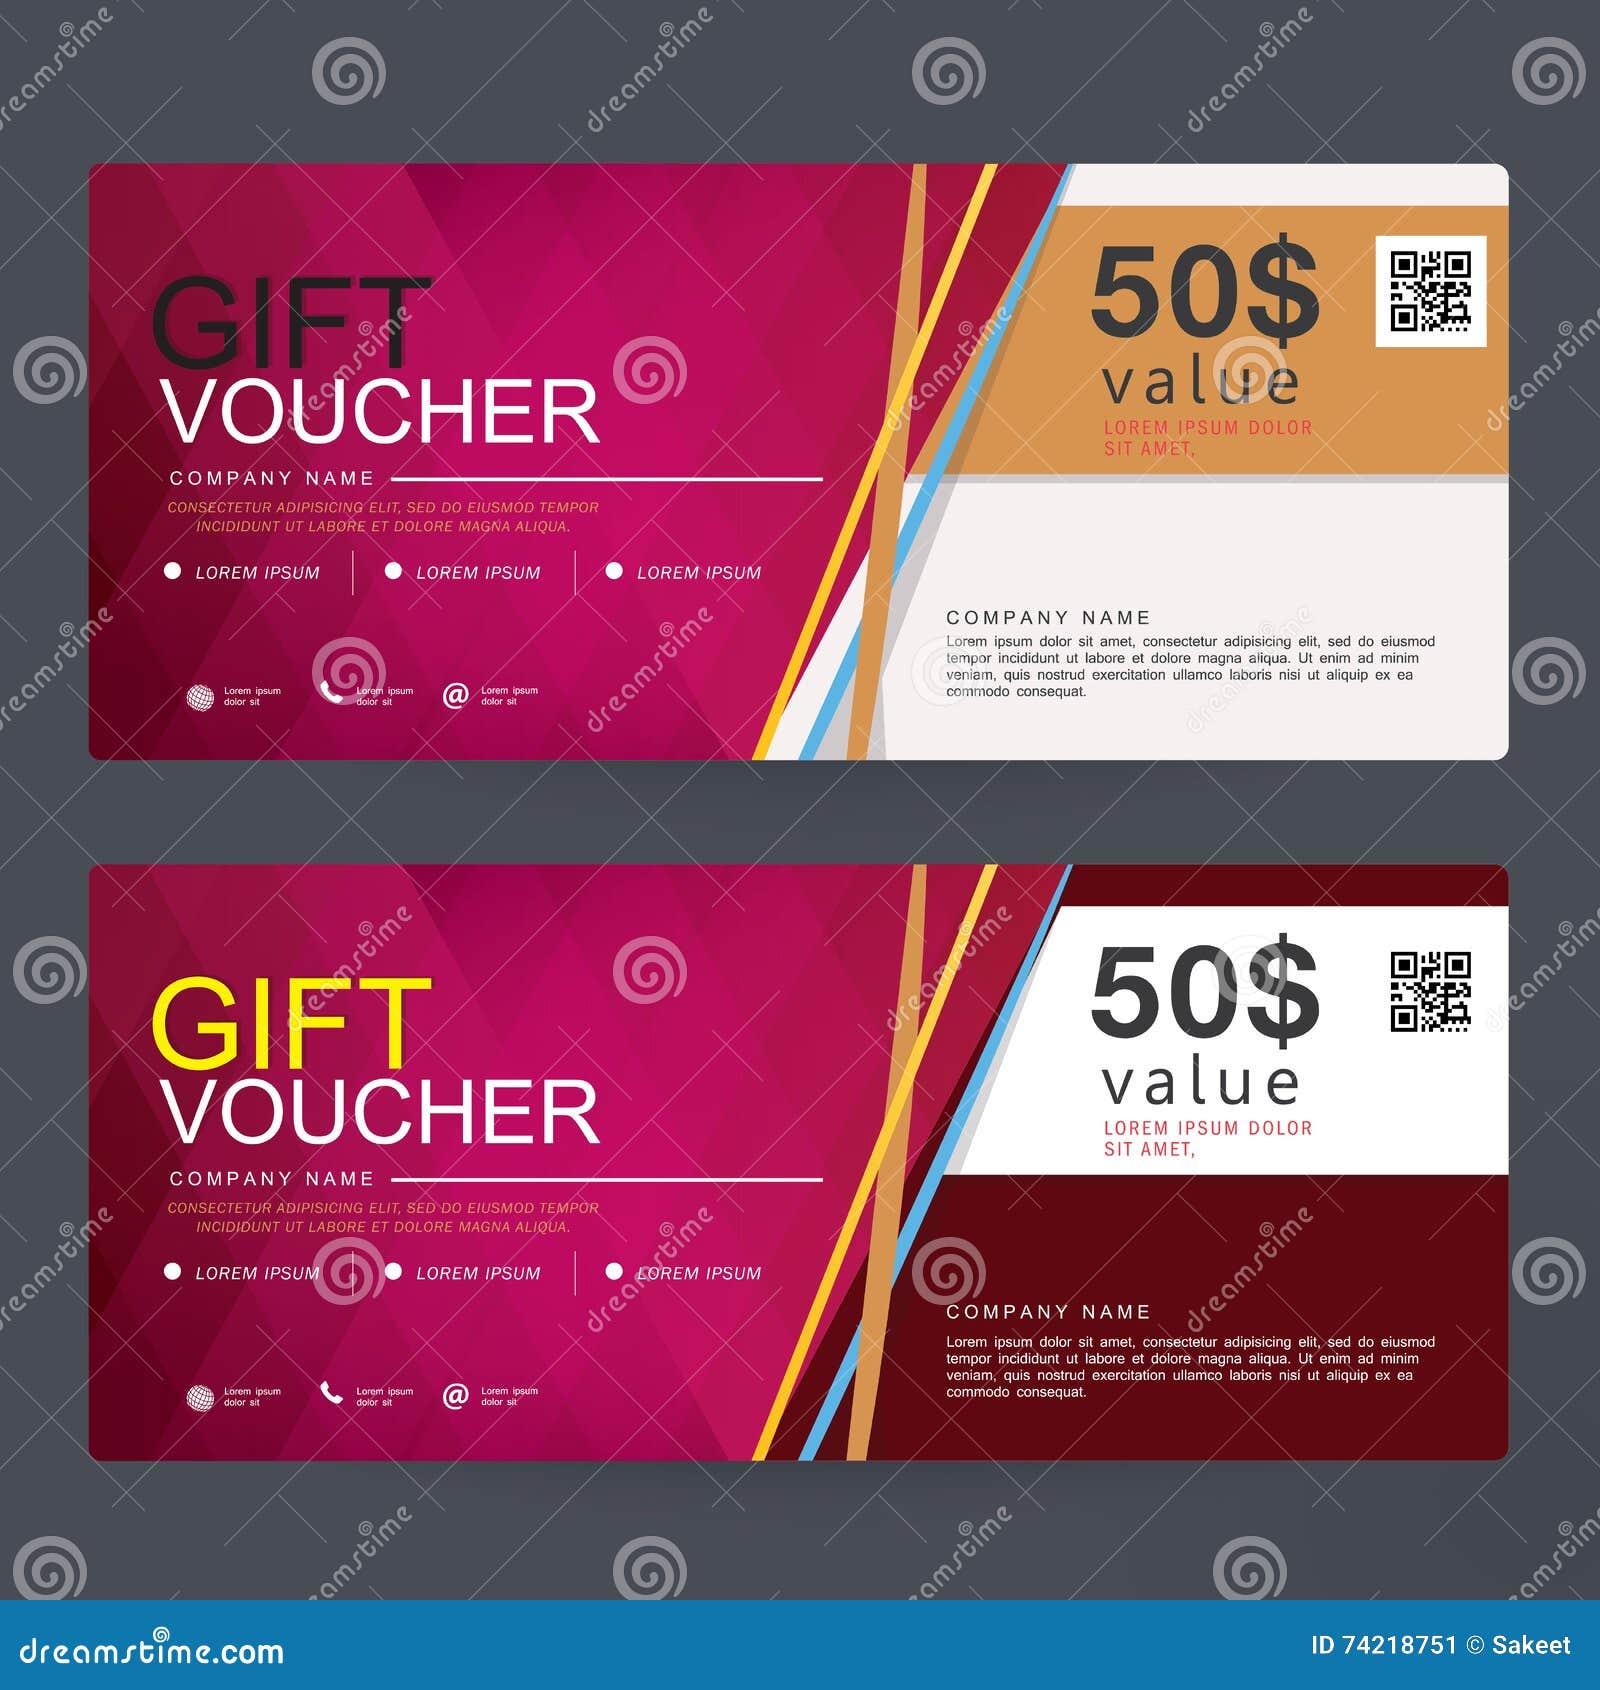 Gift Voucher Template Design Concept For Gift Coupon Stock Vector Illustration Of Monetary Certificate 74218751